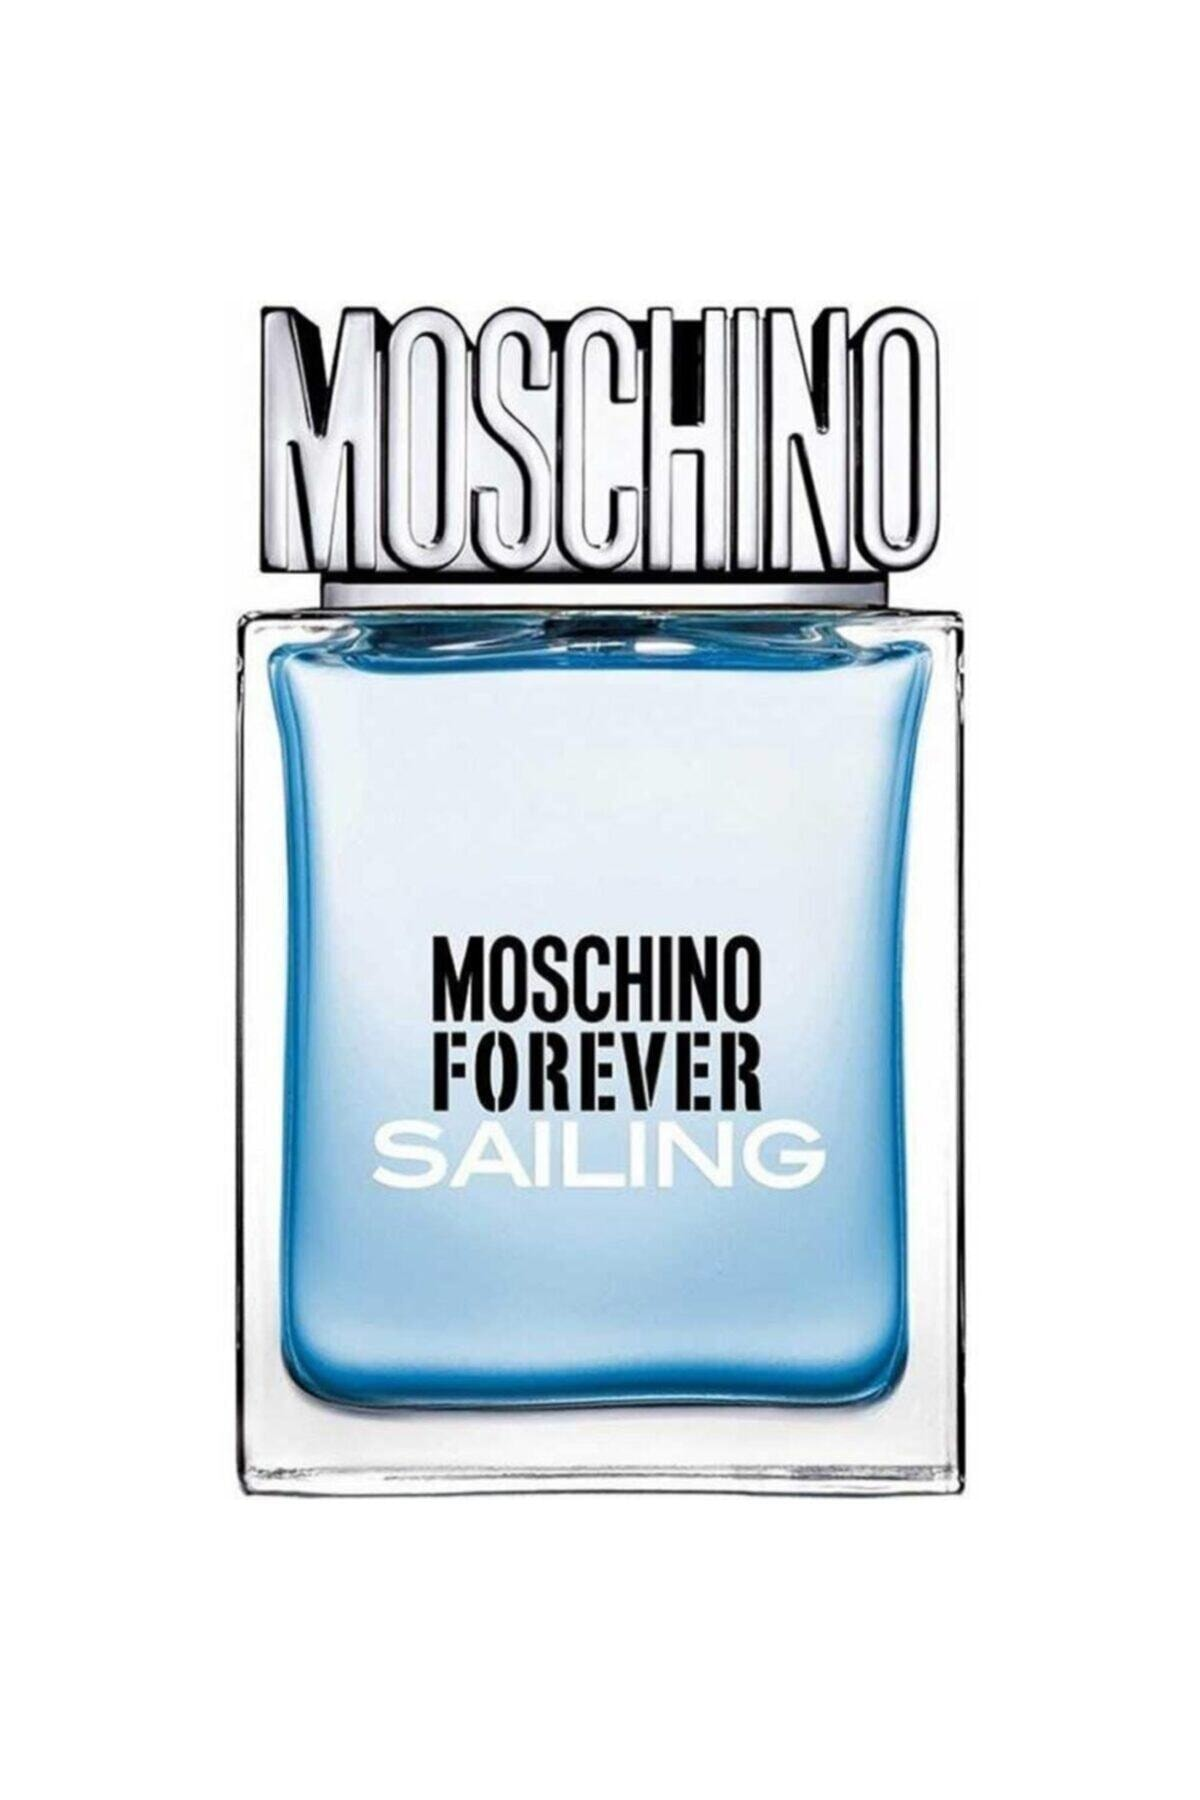 Moschino Forever Sailing Edt 100 ml Erkek Parfüm 8011003816545 1